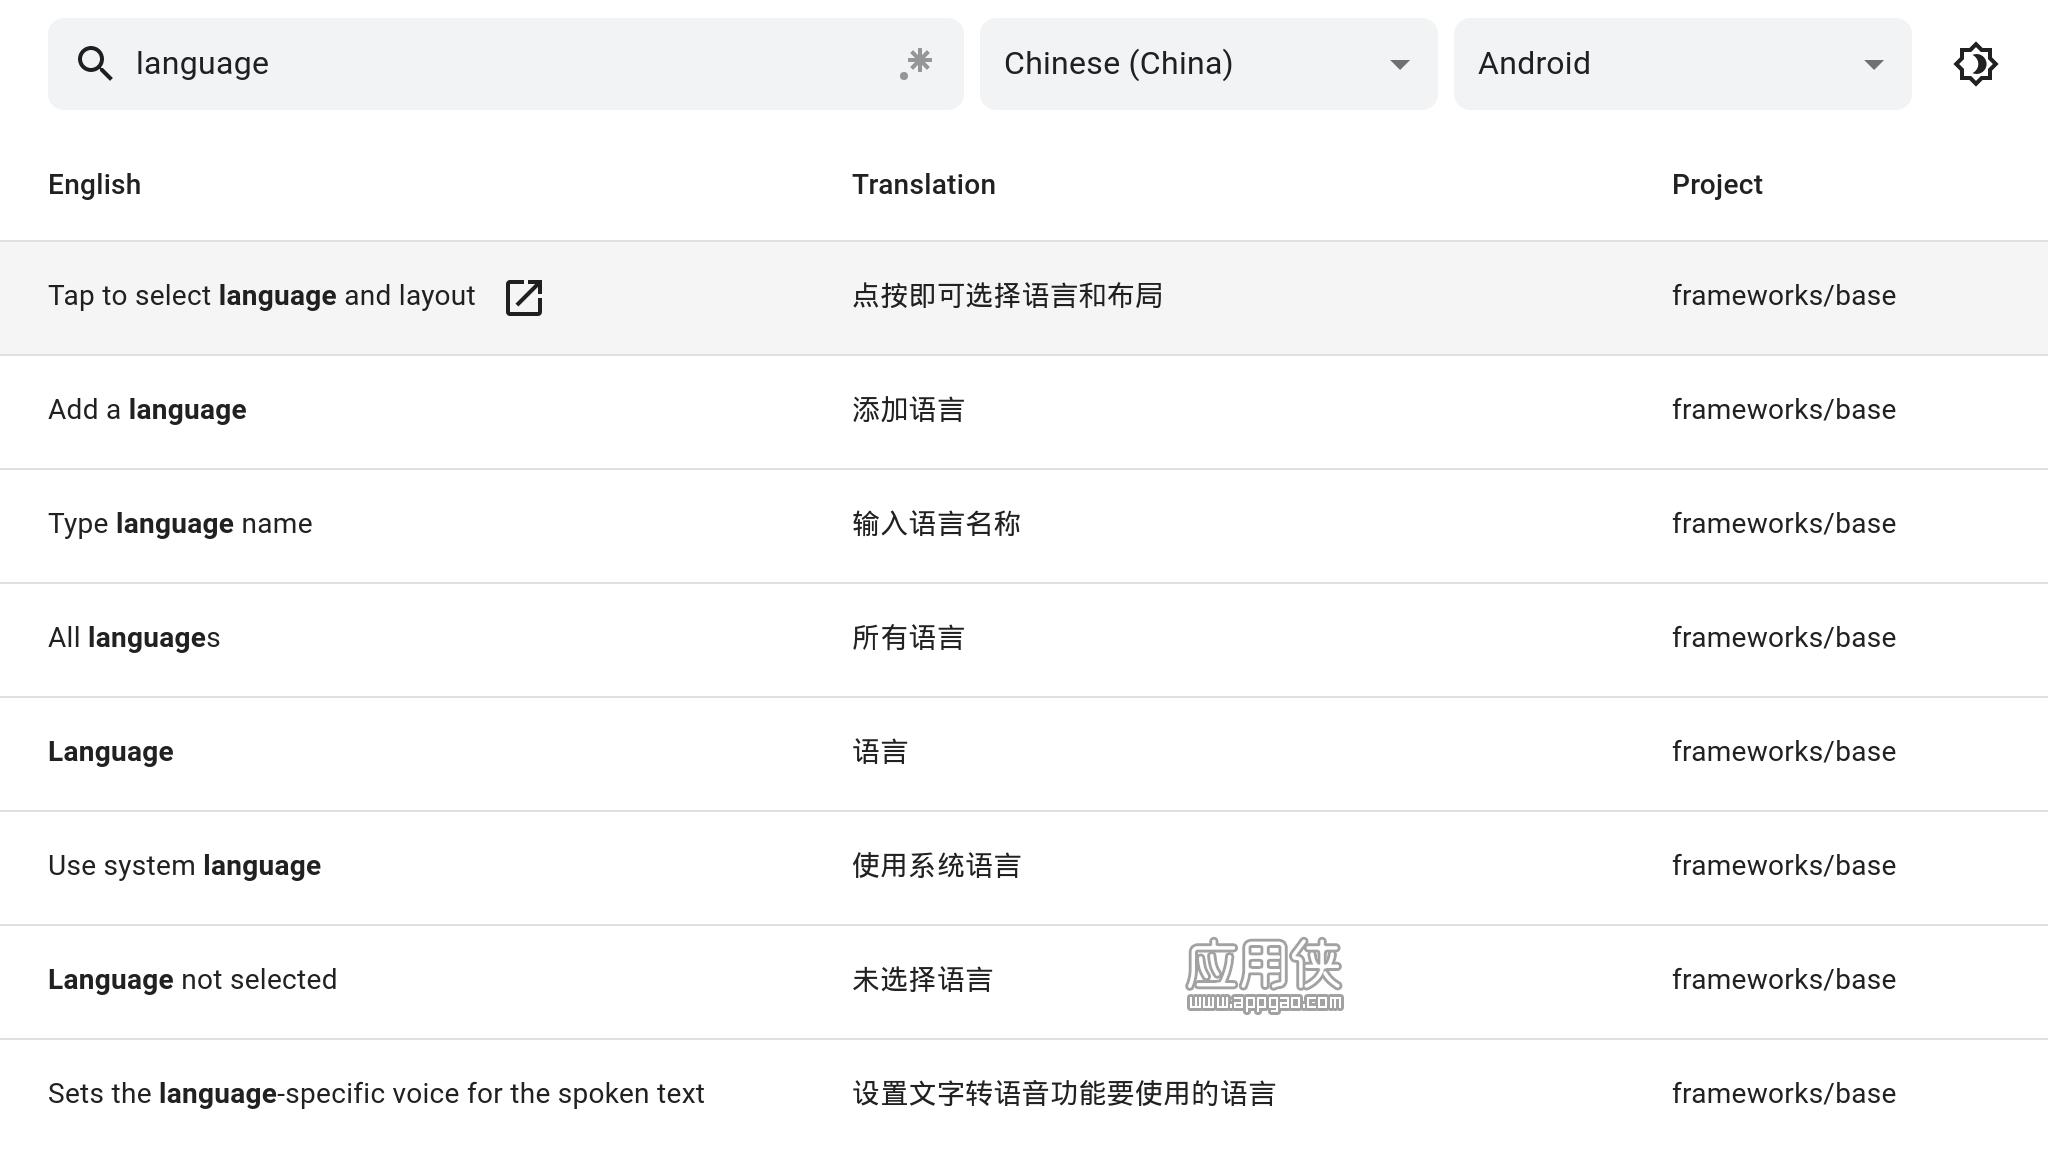 Open Source Translations - 在线搜索 Android 和 GNOME 中的术语翻译